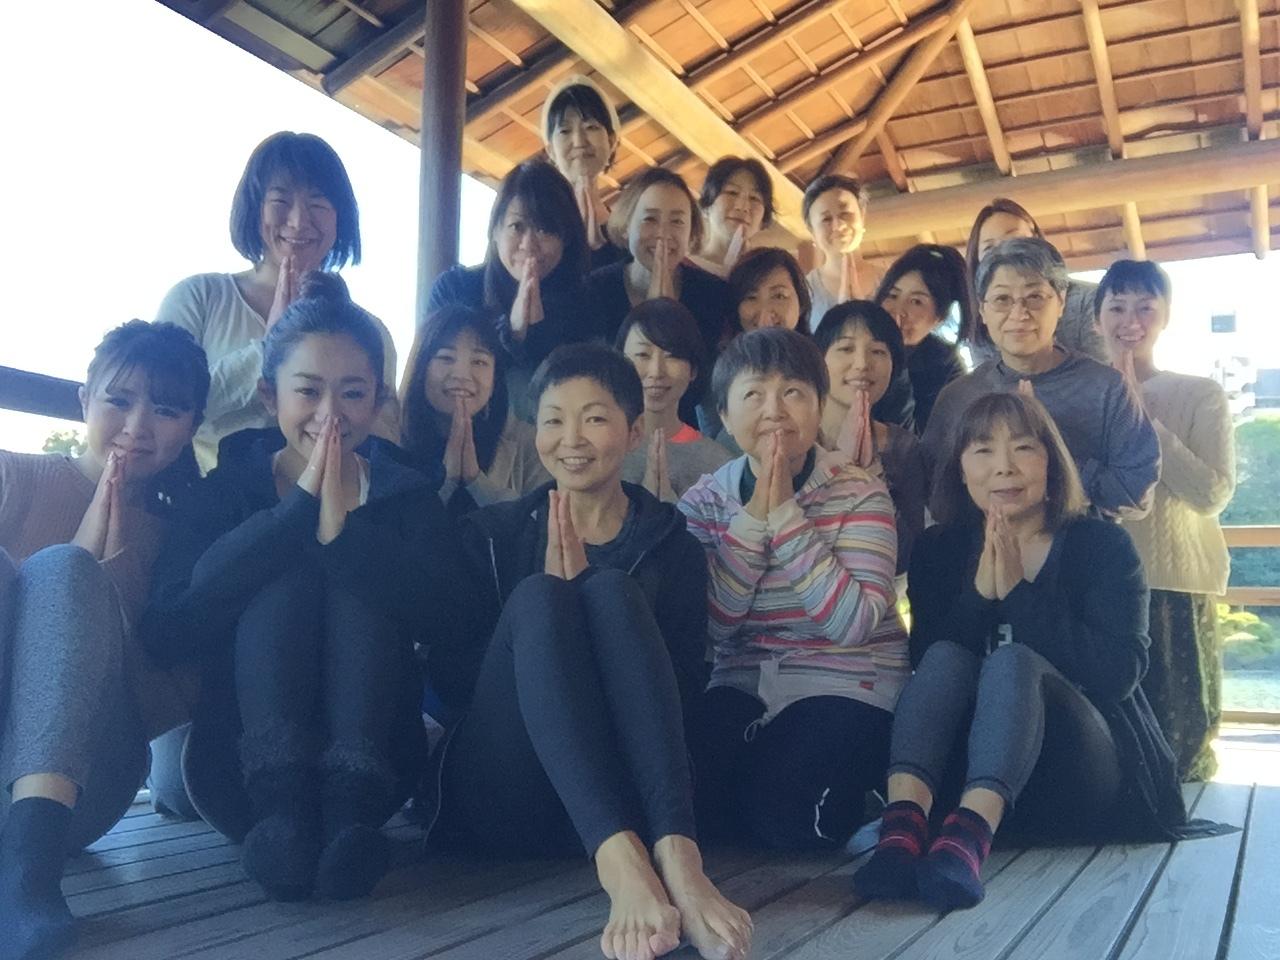 Breathing mayu yoga 7月1日開催のお知らせです♪_a0267845_21384765.jpg